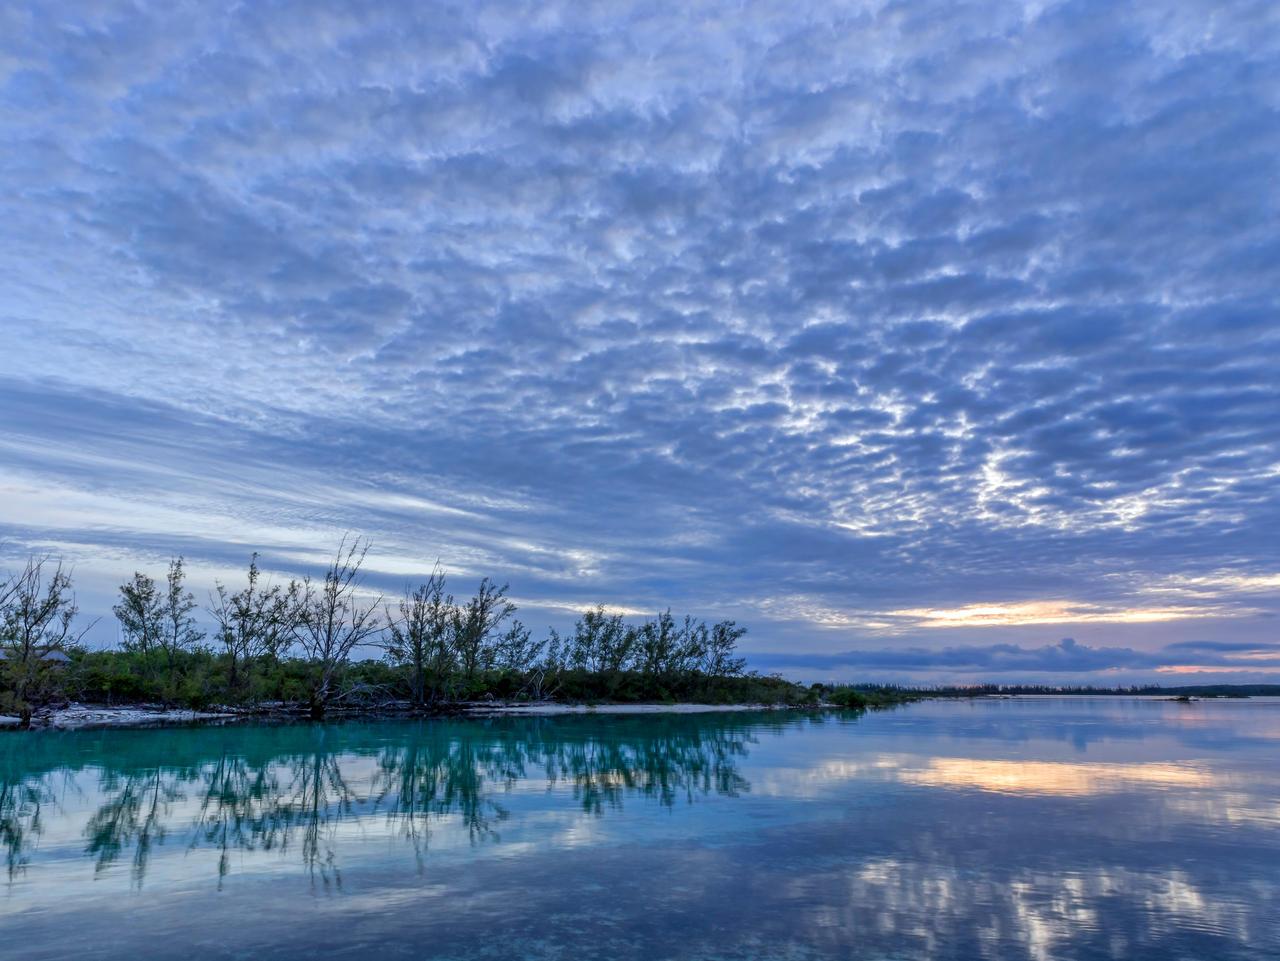 Sunset Orange Creek by peterpateman